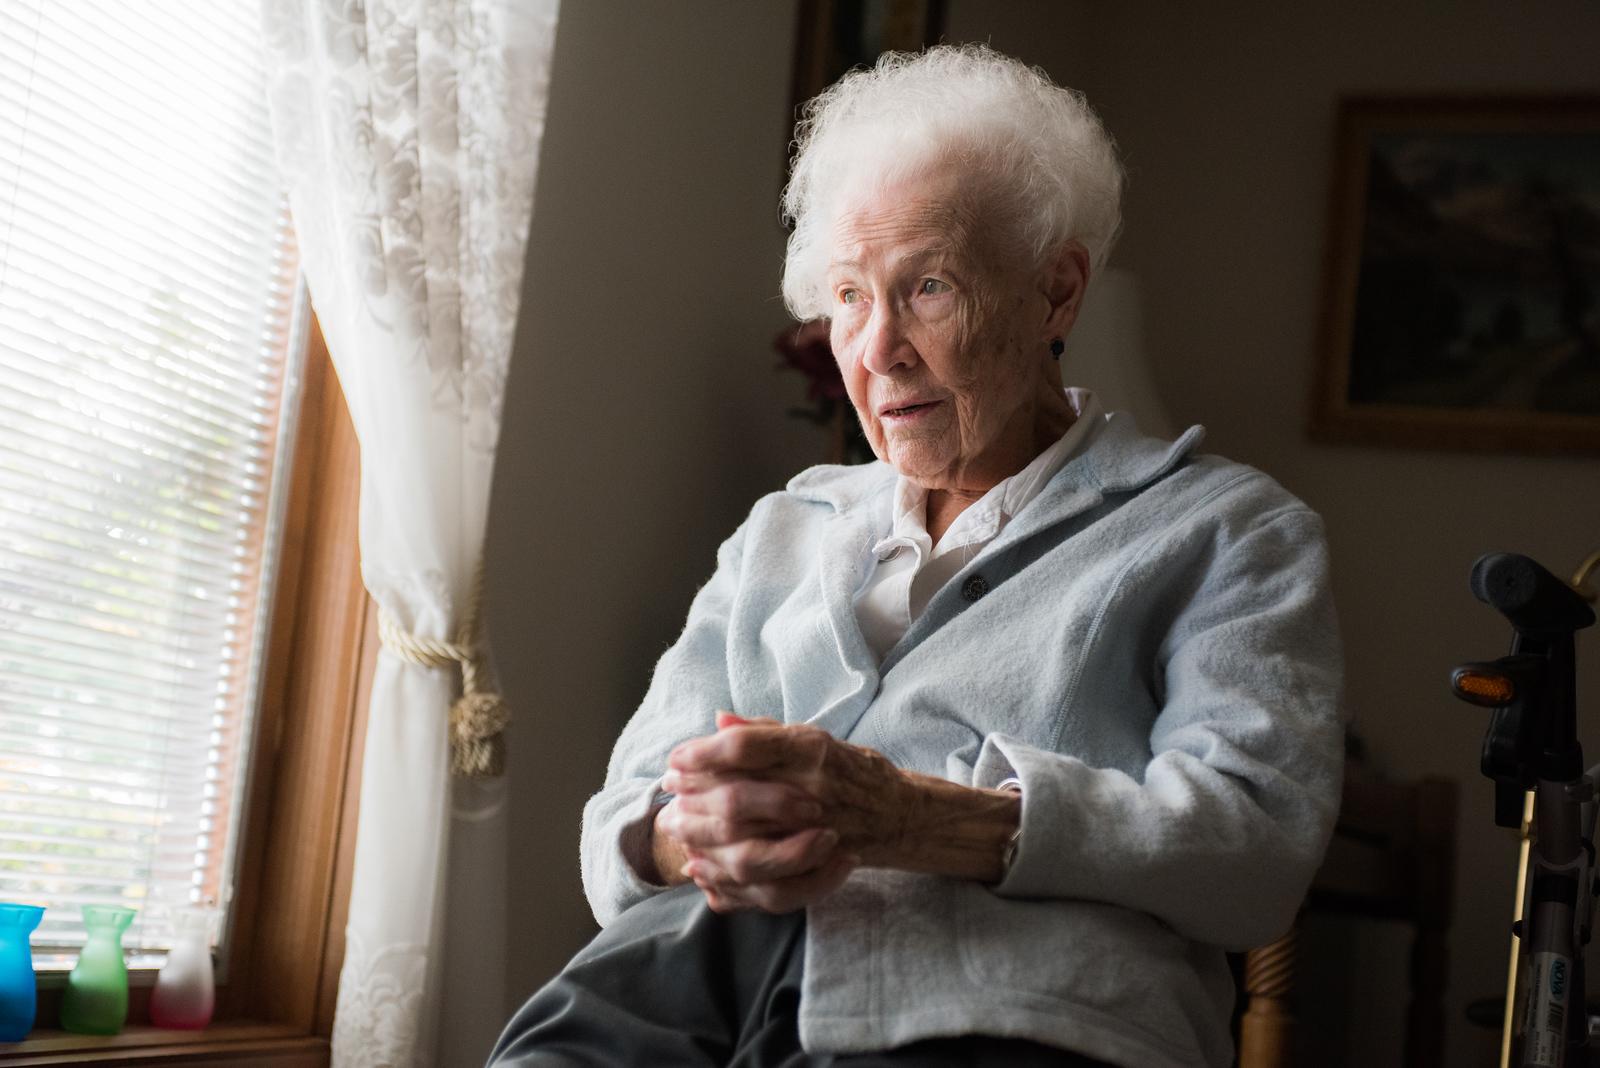 2017.11.11 - Grandma Lotus Mae Hilton Webb at 101 years old